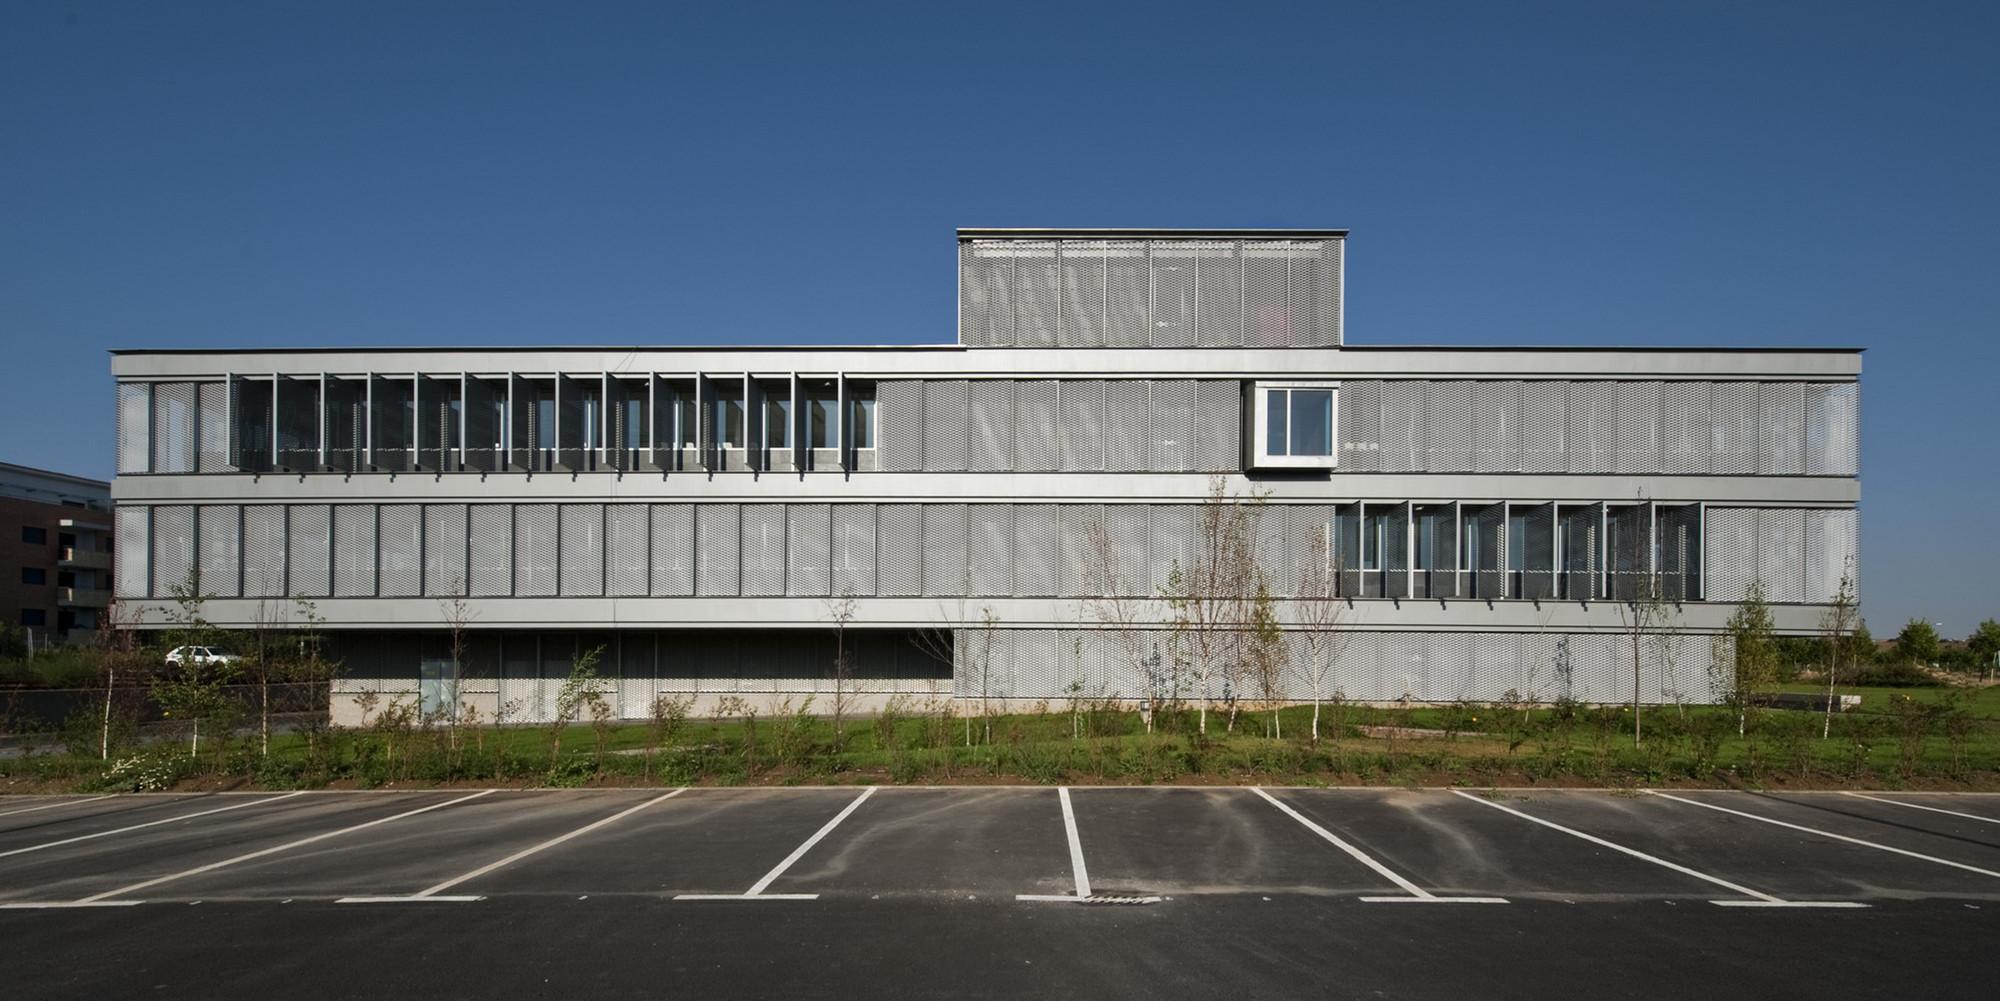 M2 Technological Building,  University of Salamanca / Sanchez Gil Arquitectos, © Fernando Sánchez Cuadrado